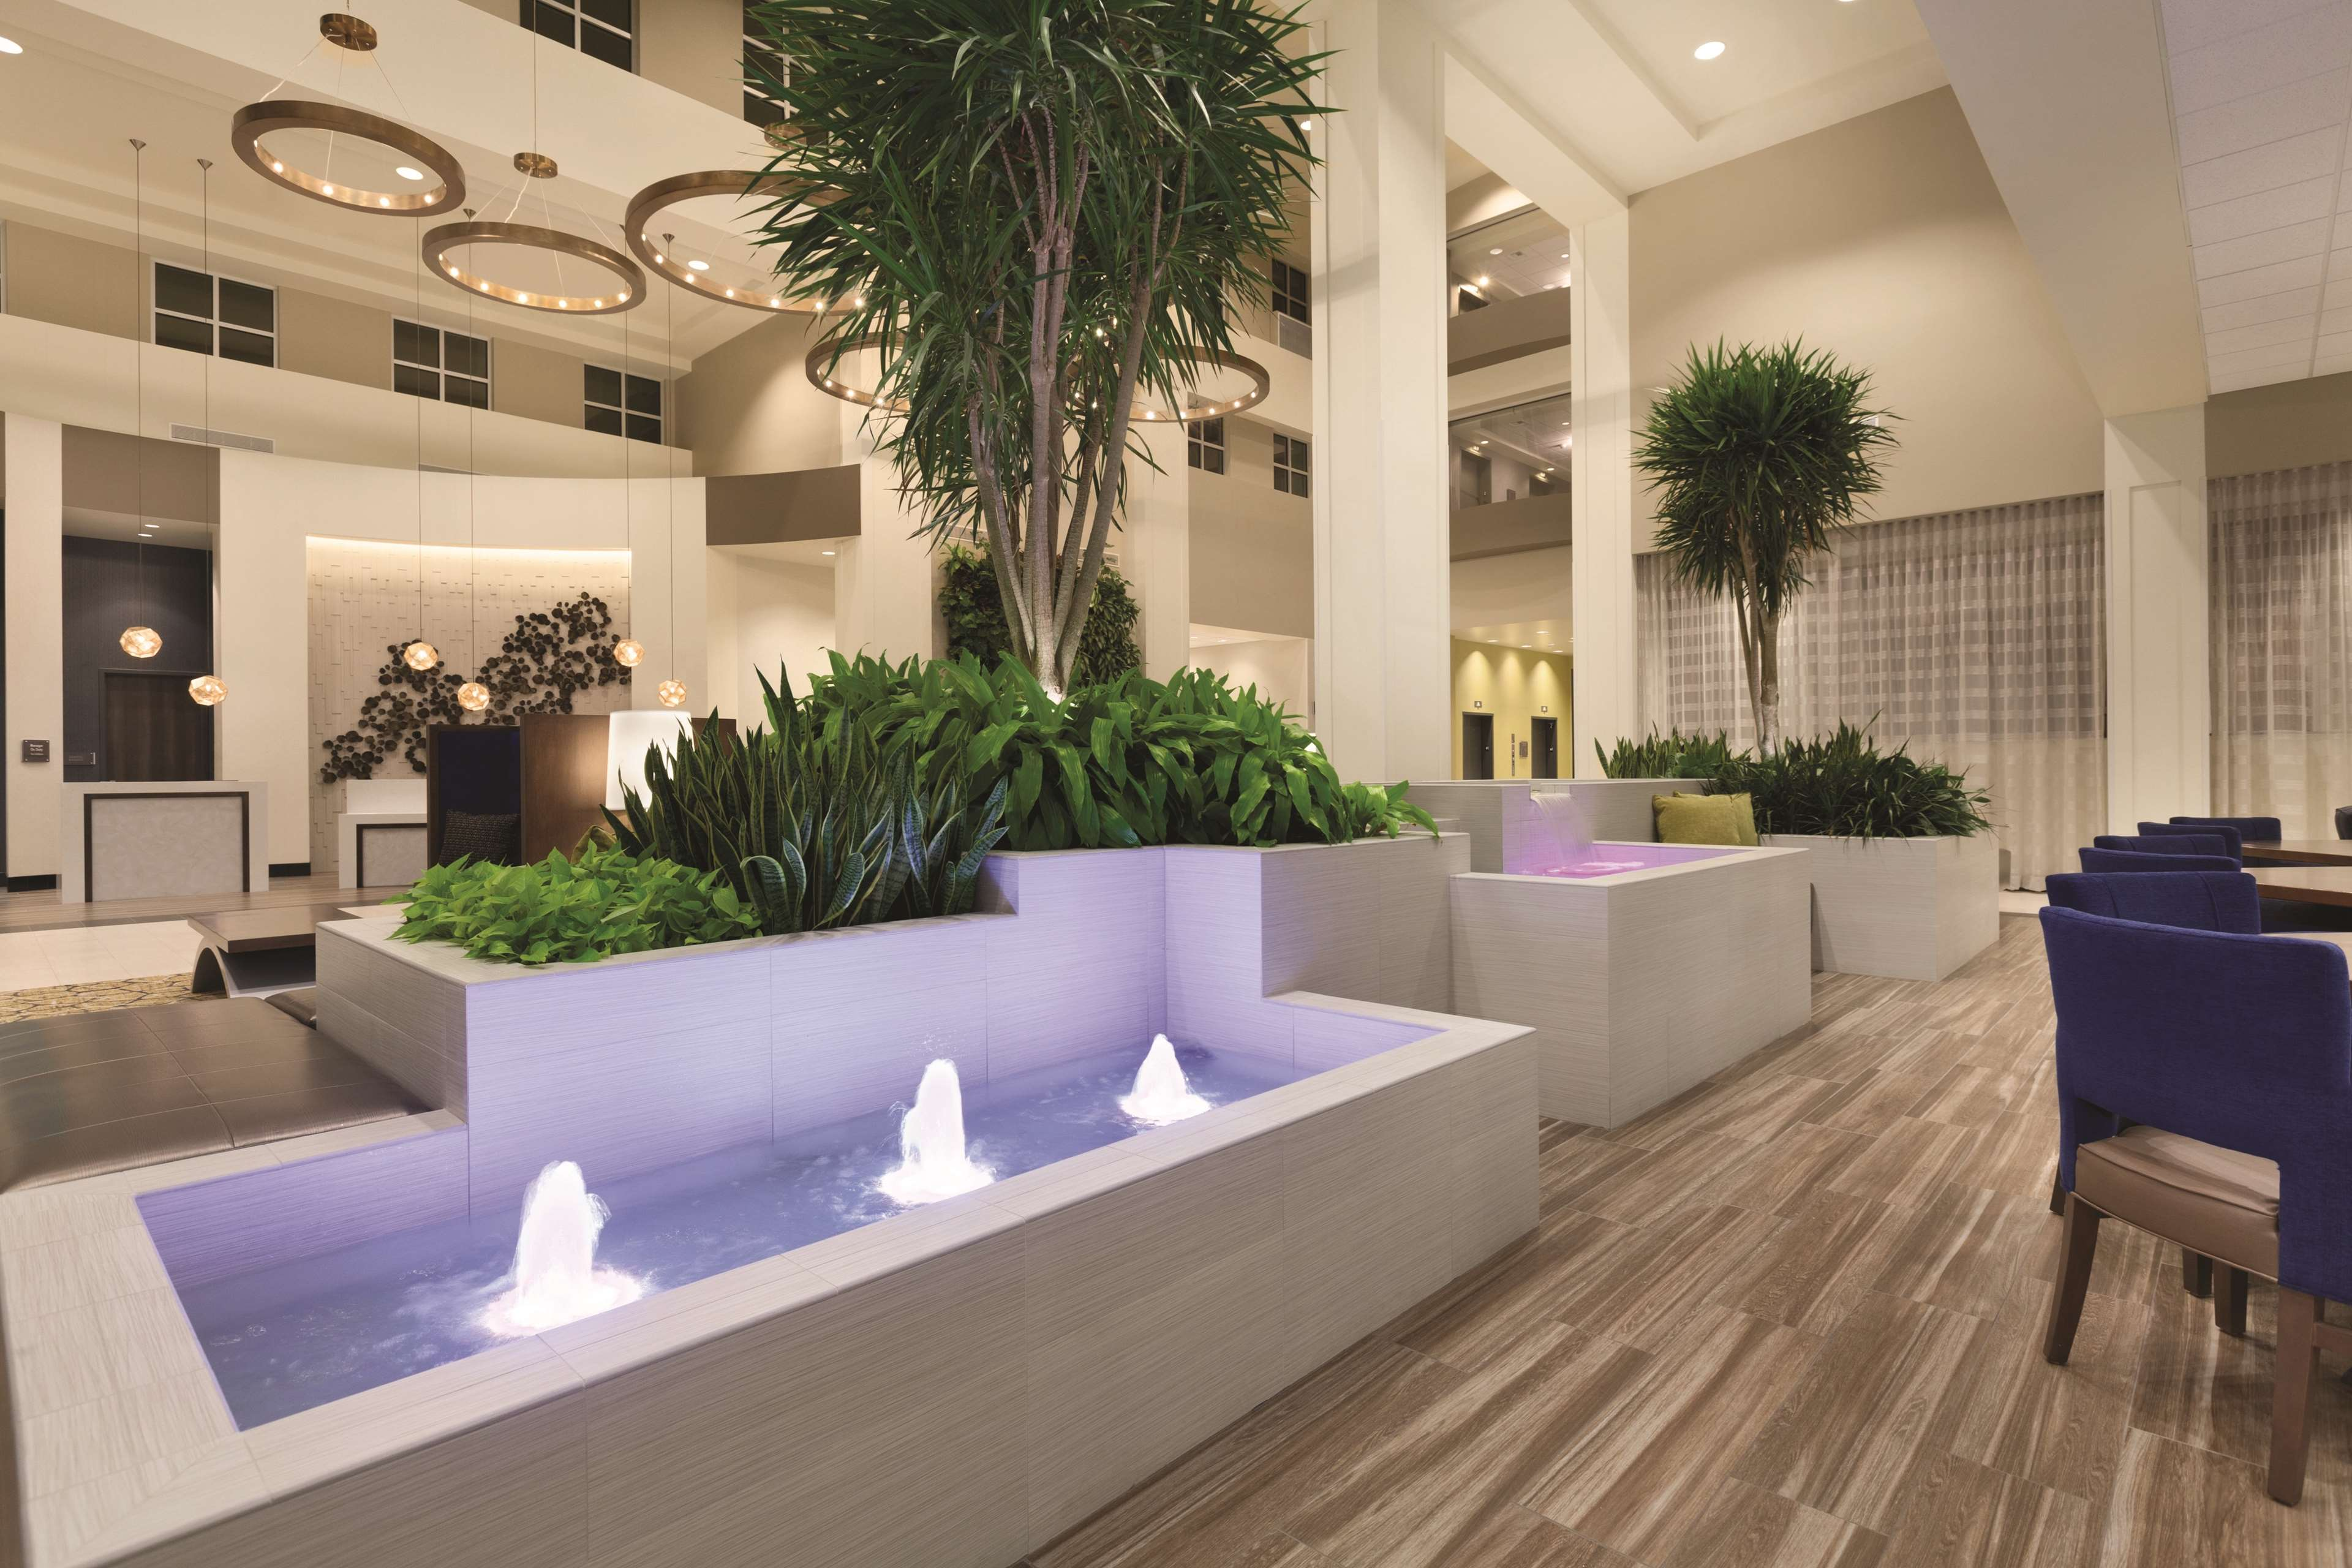 Embassy Suites by Hilton Portland Hillsboro, Oregon image 3